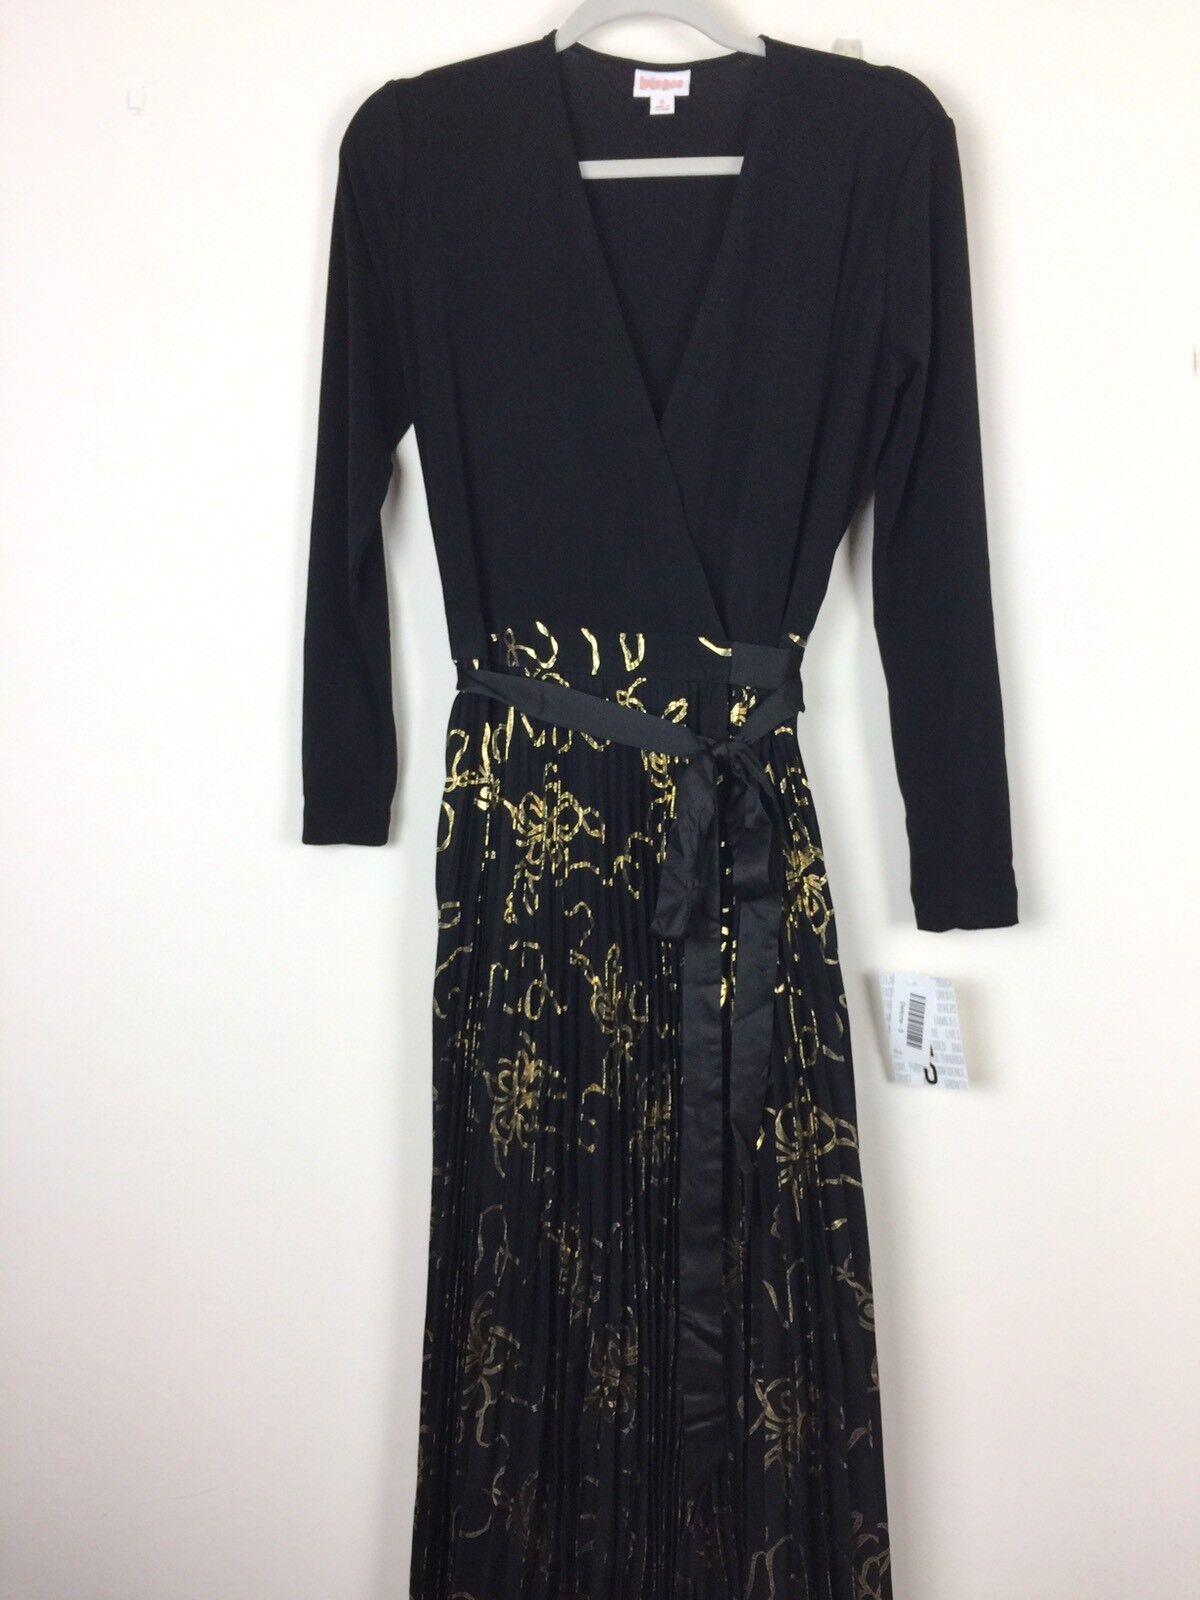 NWT LuLaRoe Elegant DeAnne Wrap Dress schwarz With Gold Floral Pattern Größe Small